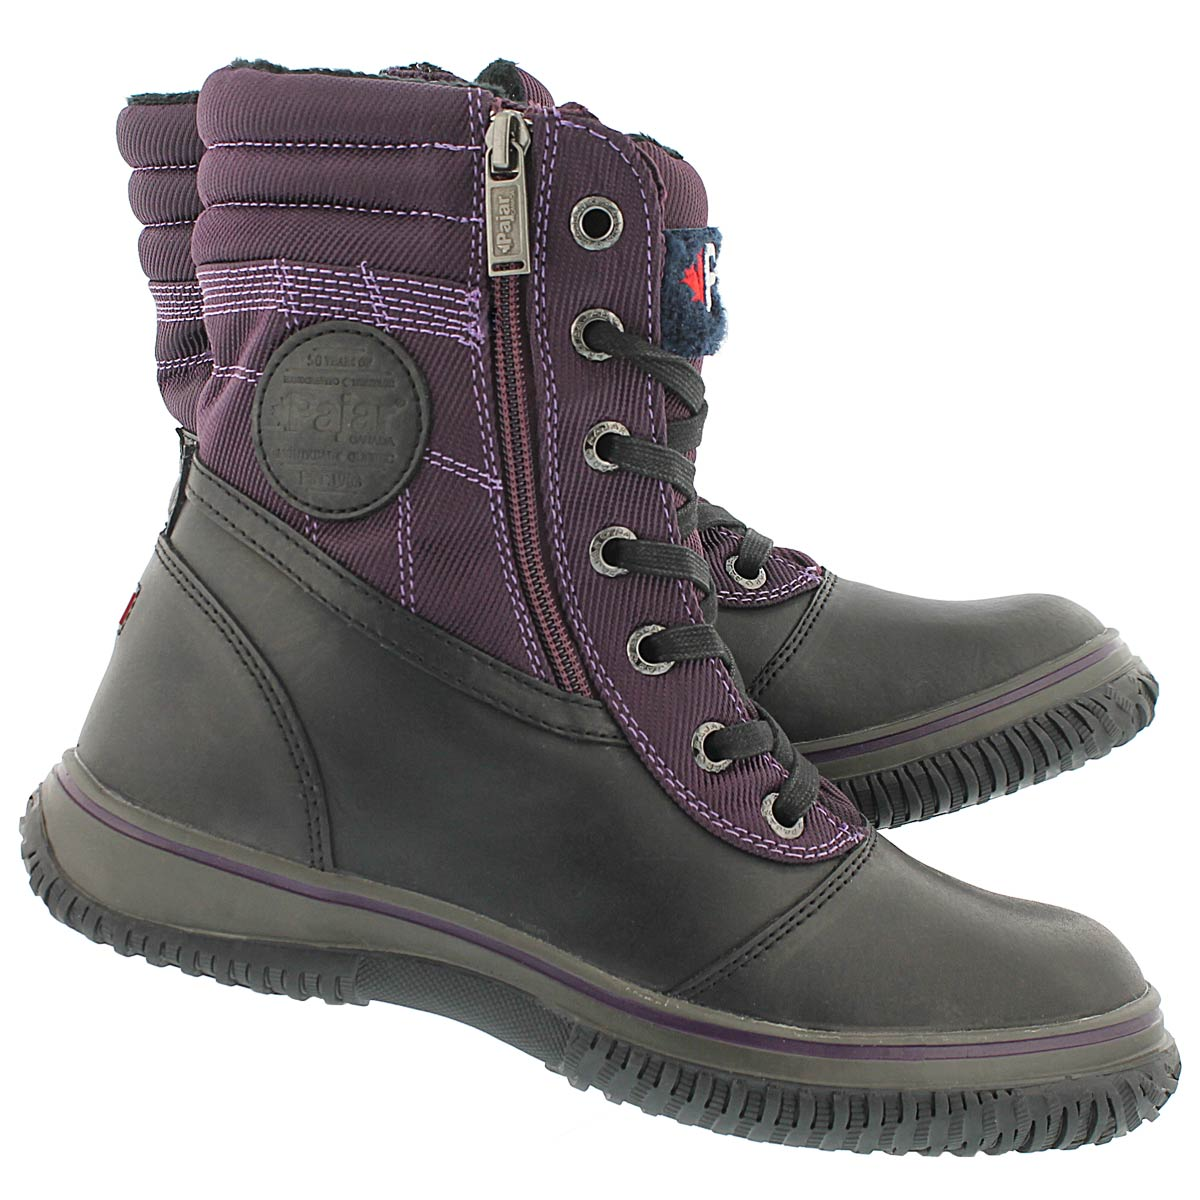 Lds Leslie blk/purple wtpf winter boot